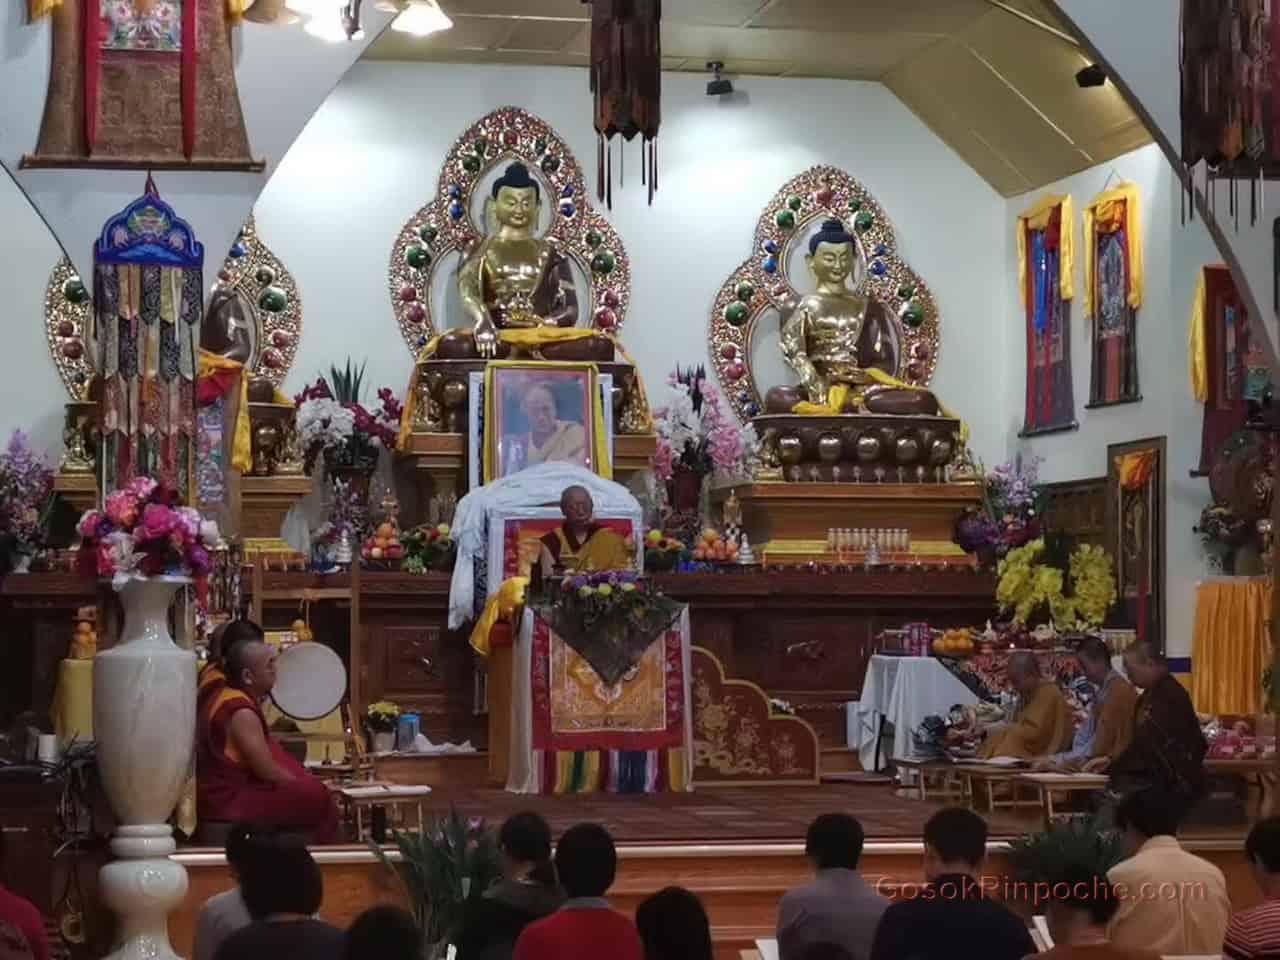 Gosok Ronpoche lama chopa 20190926203442